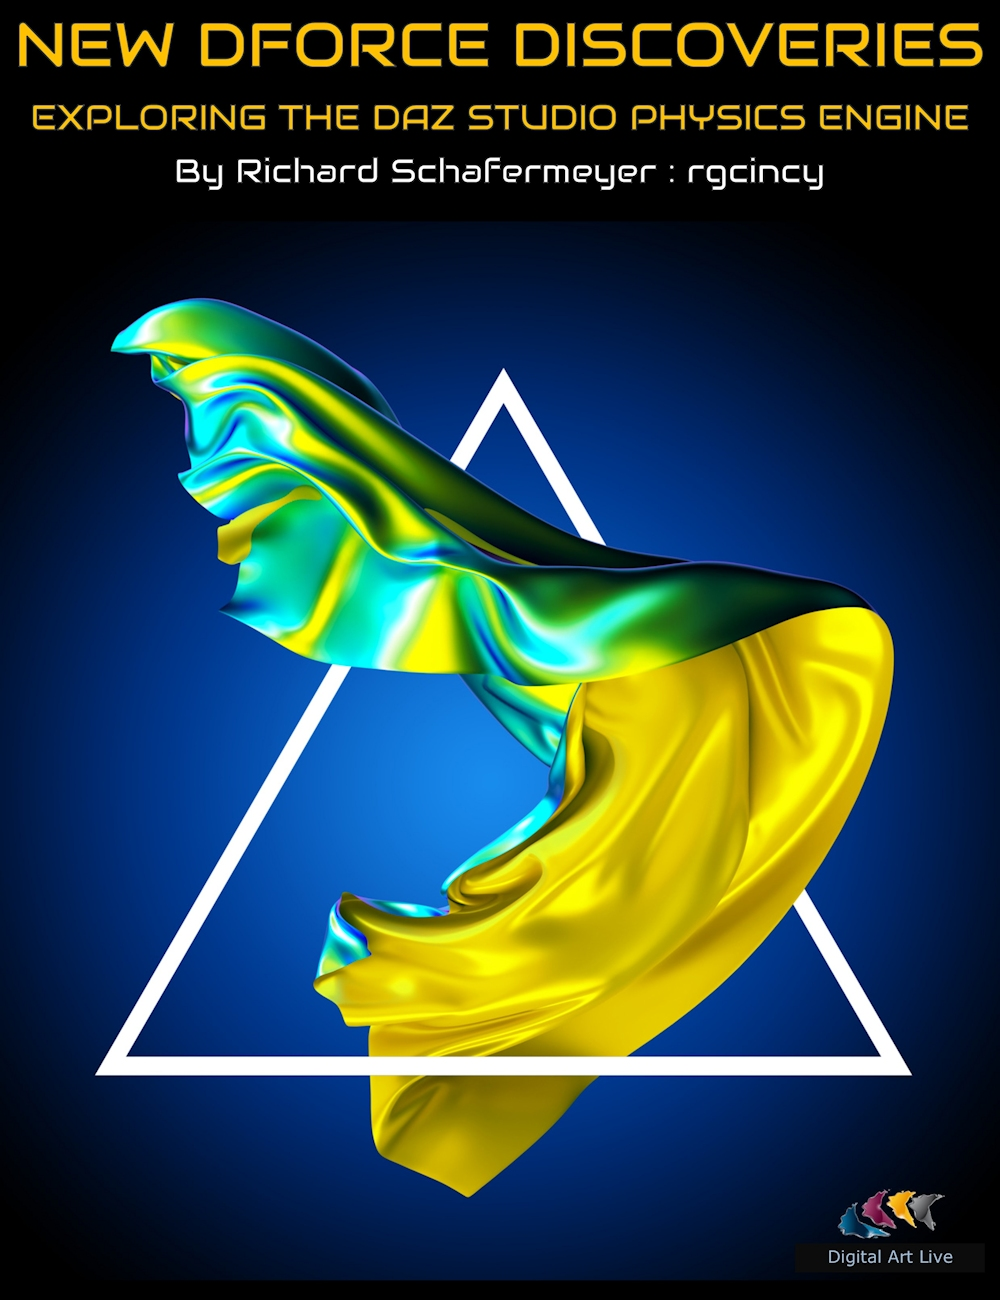 New dForce Discoveries by: Digital Art Live, 3D Models by Daz 3D